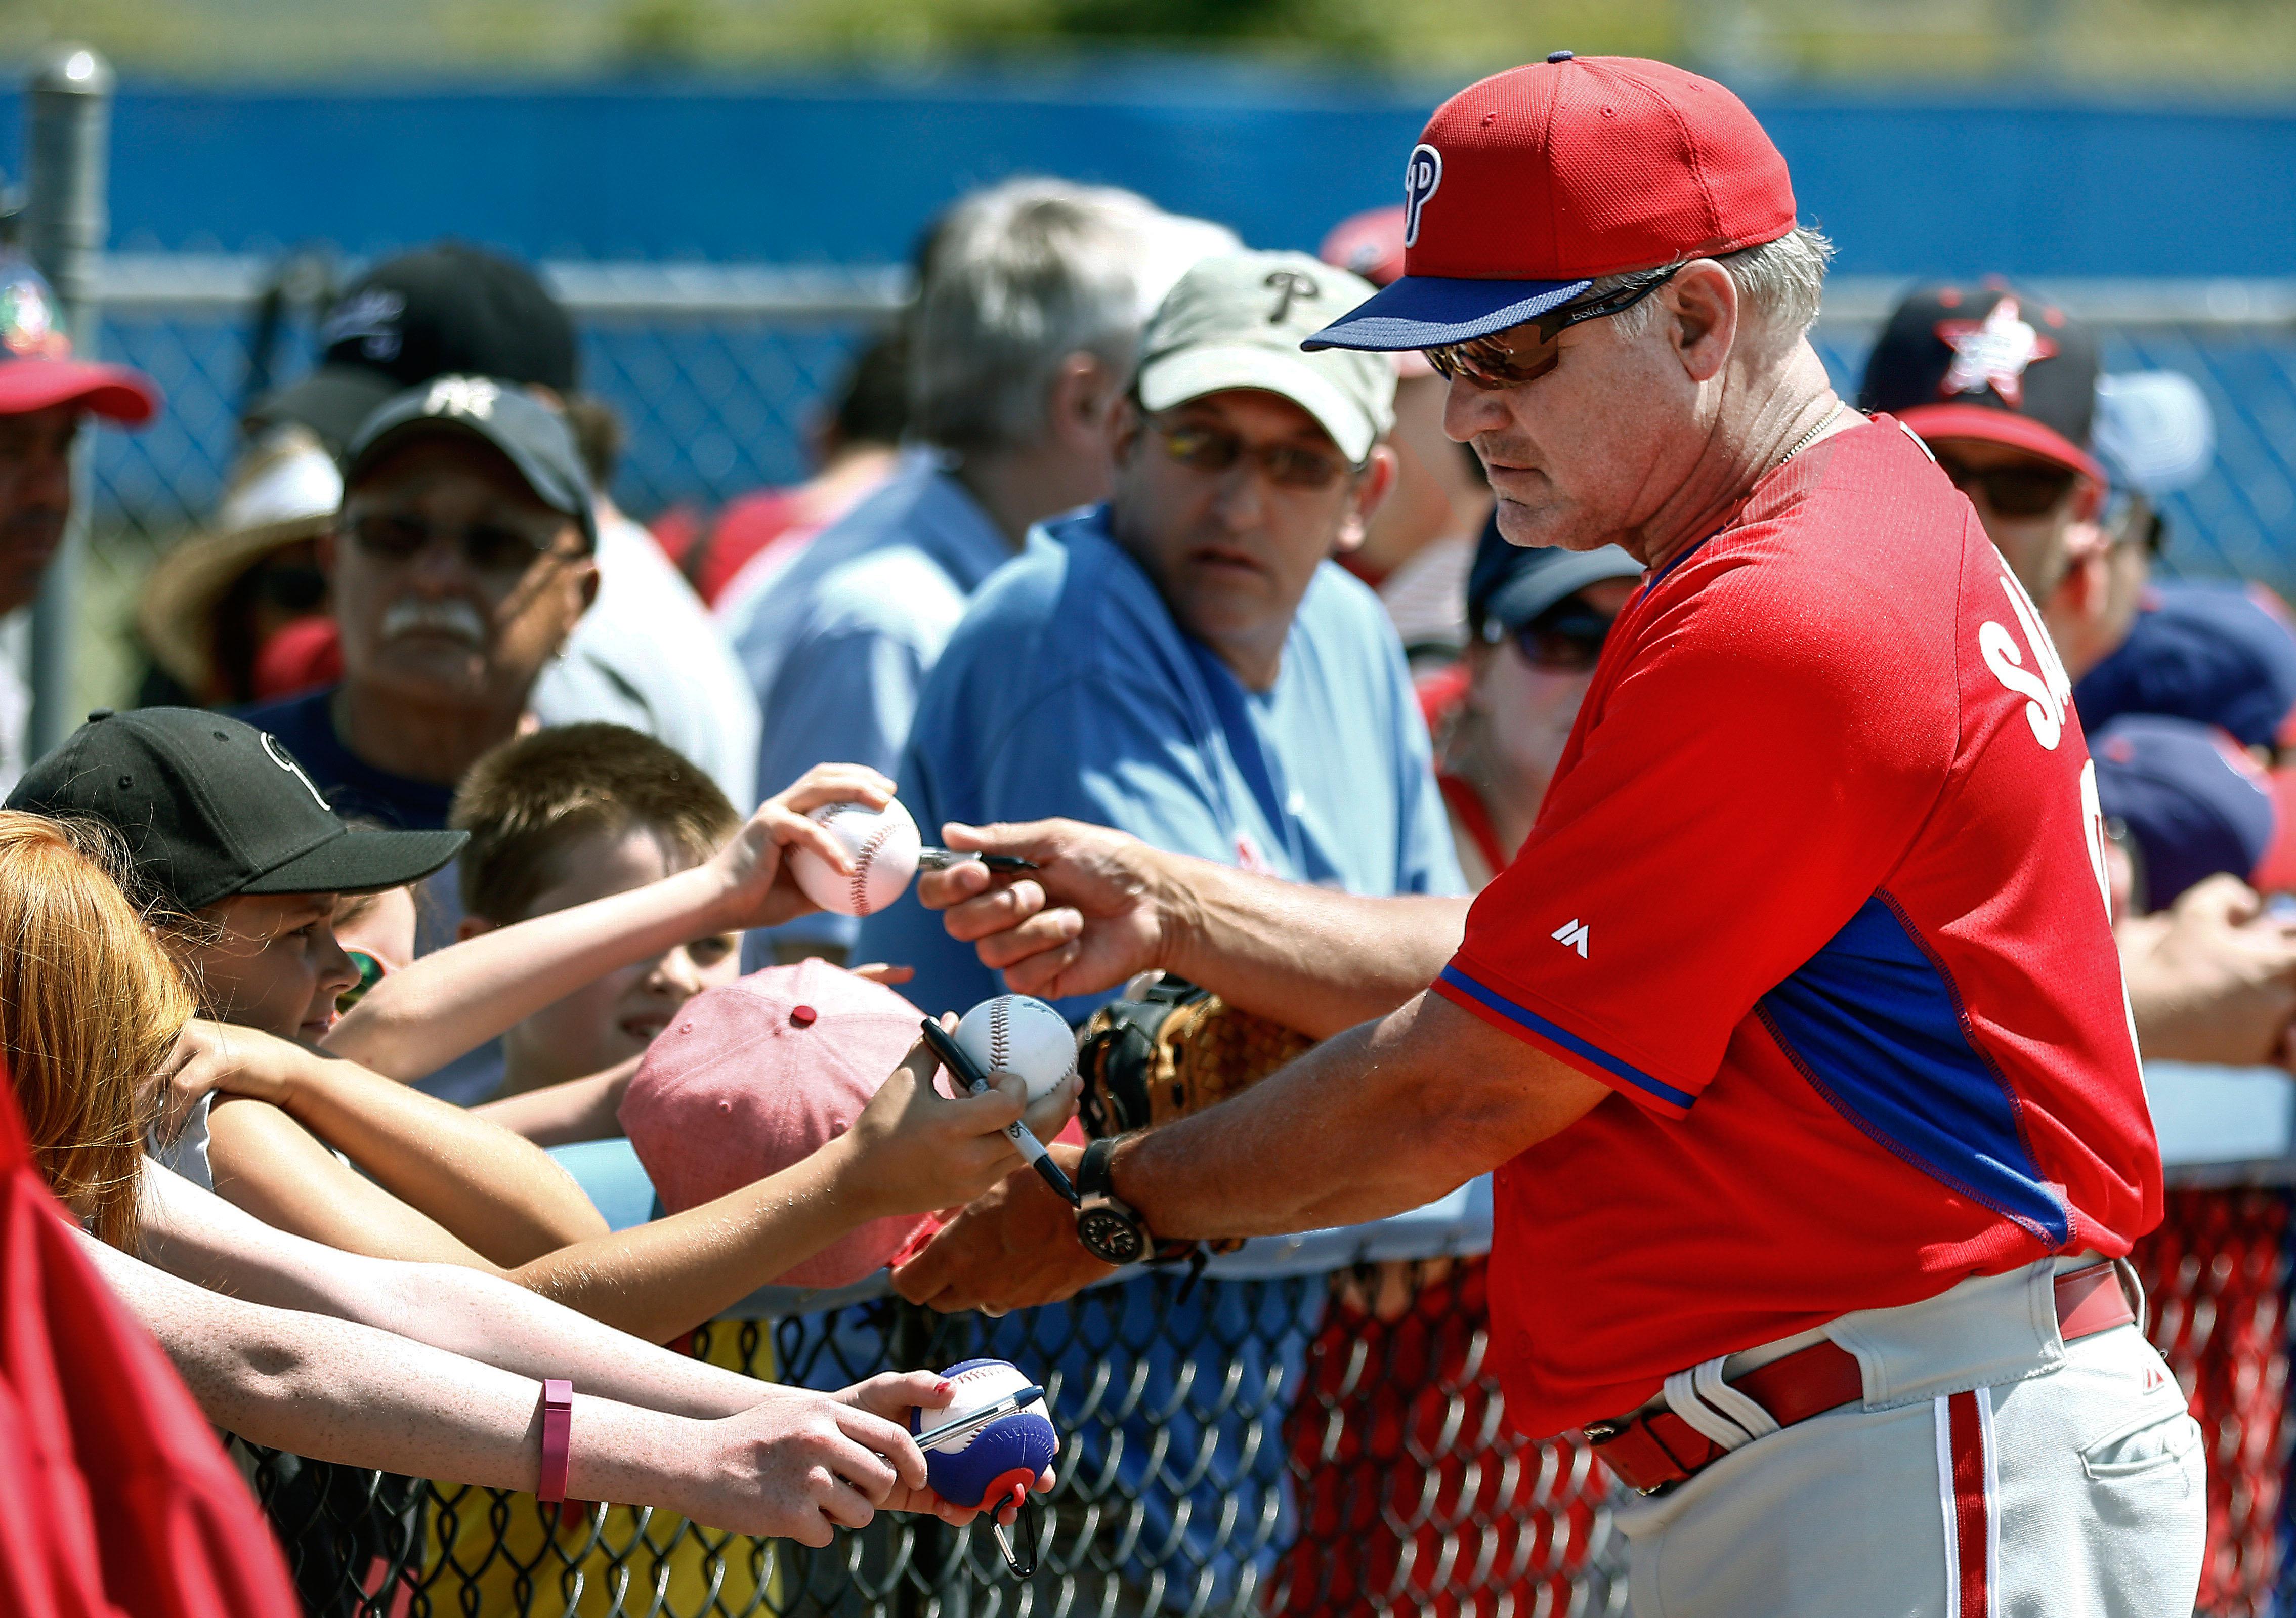 Phillies' Manager Ryne Sandberg interviews potential bullpen candidates.